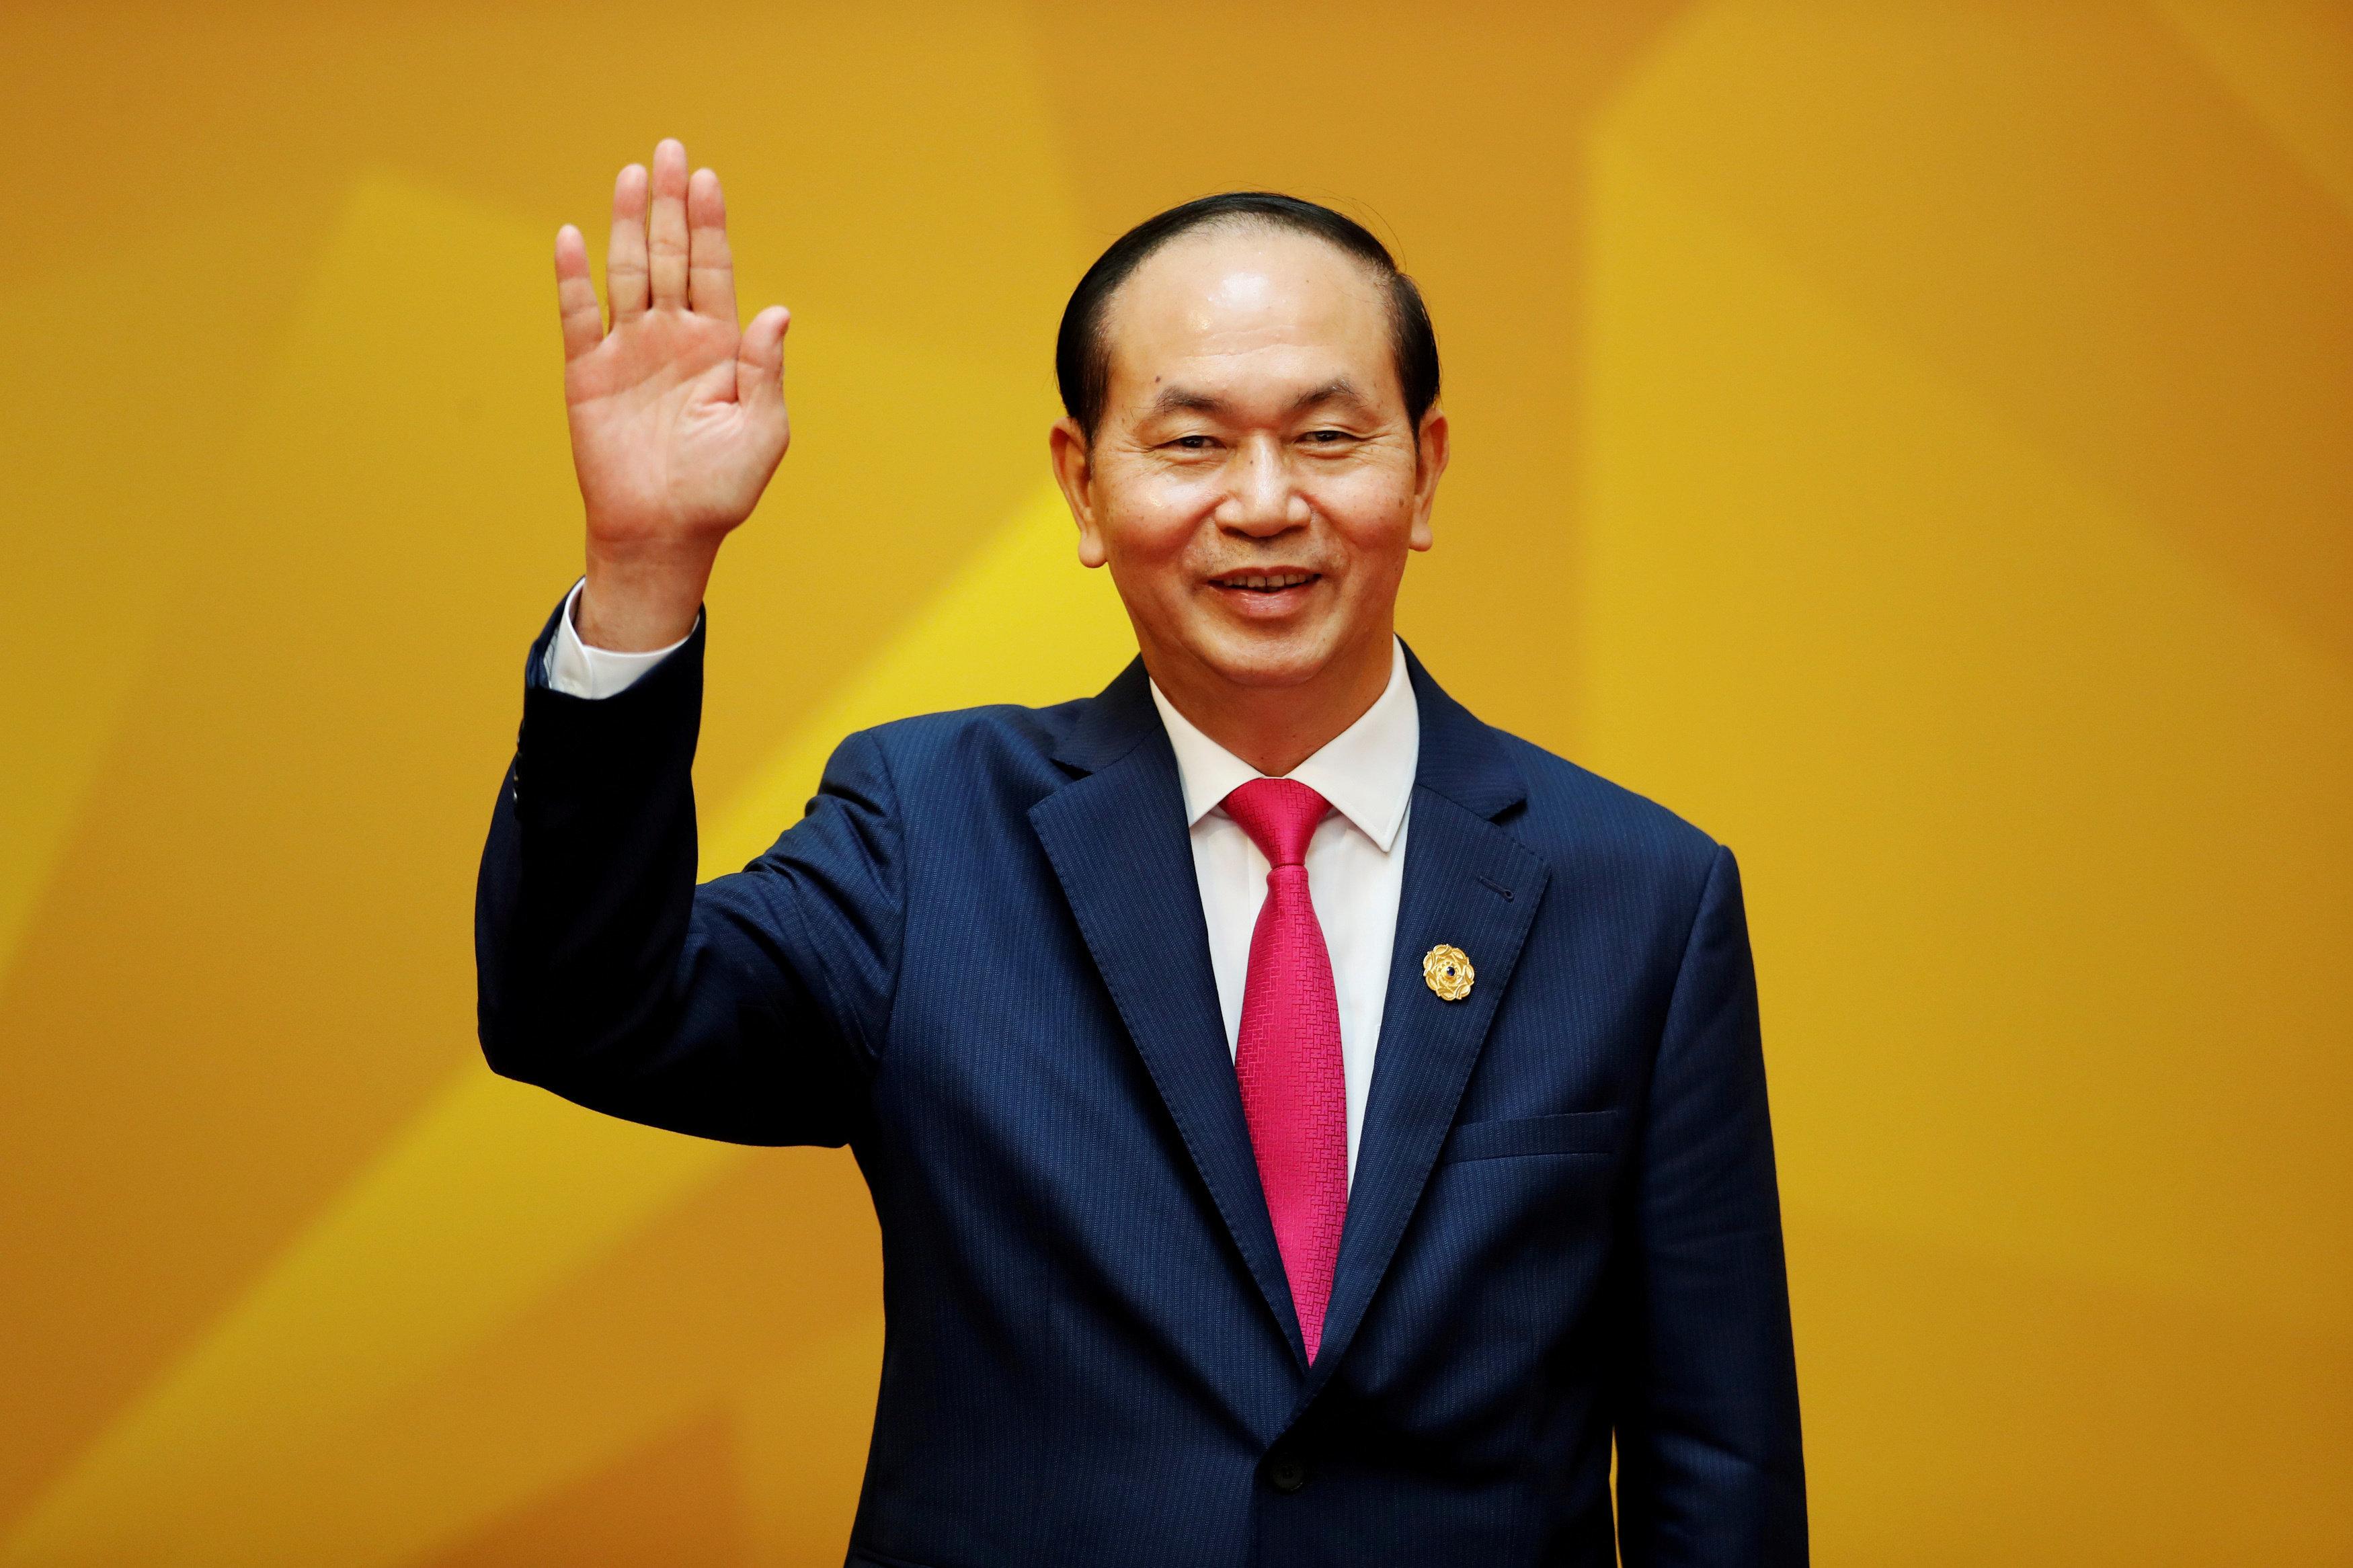 Tran Dai Quang was elected president of Vietnam in April 2016.